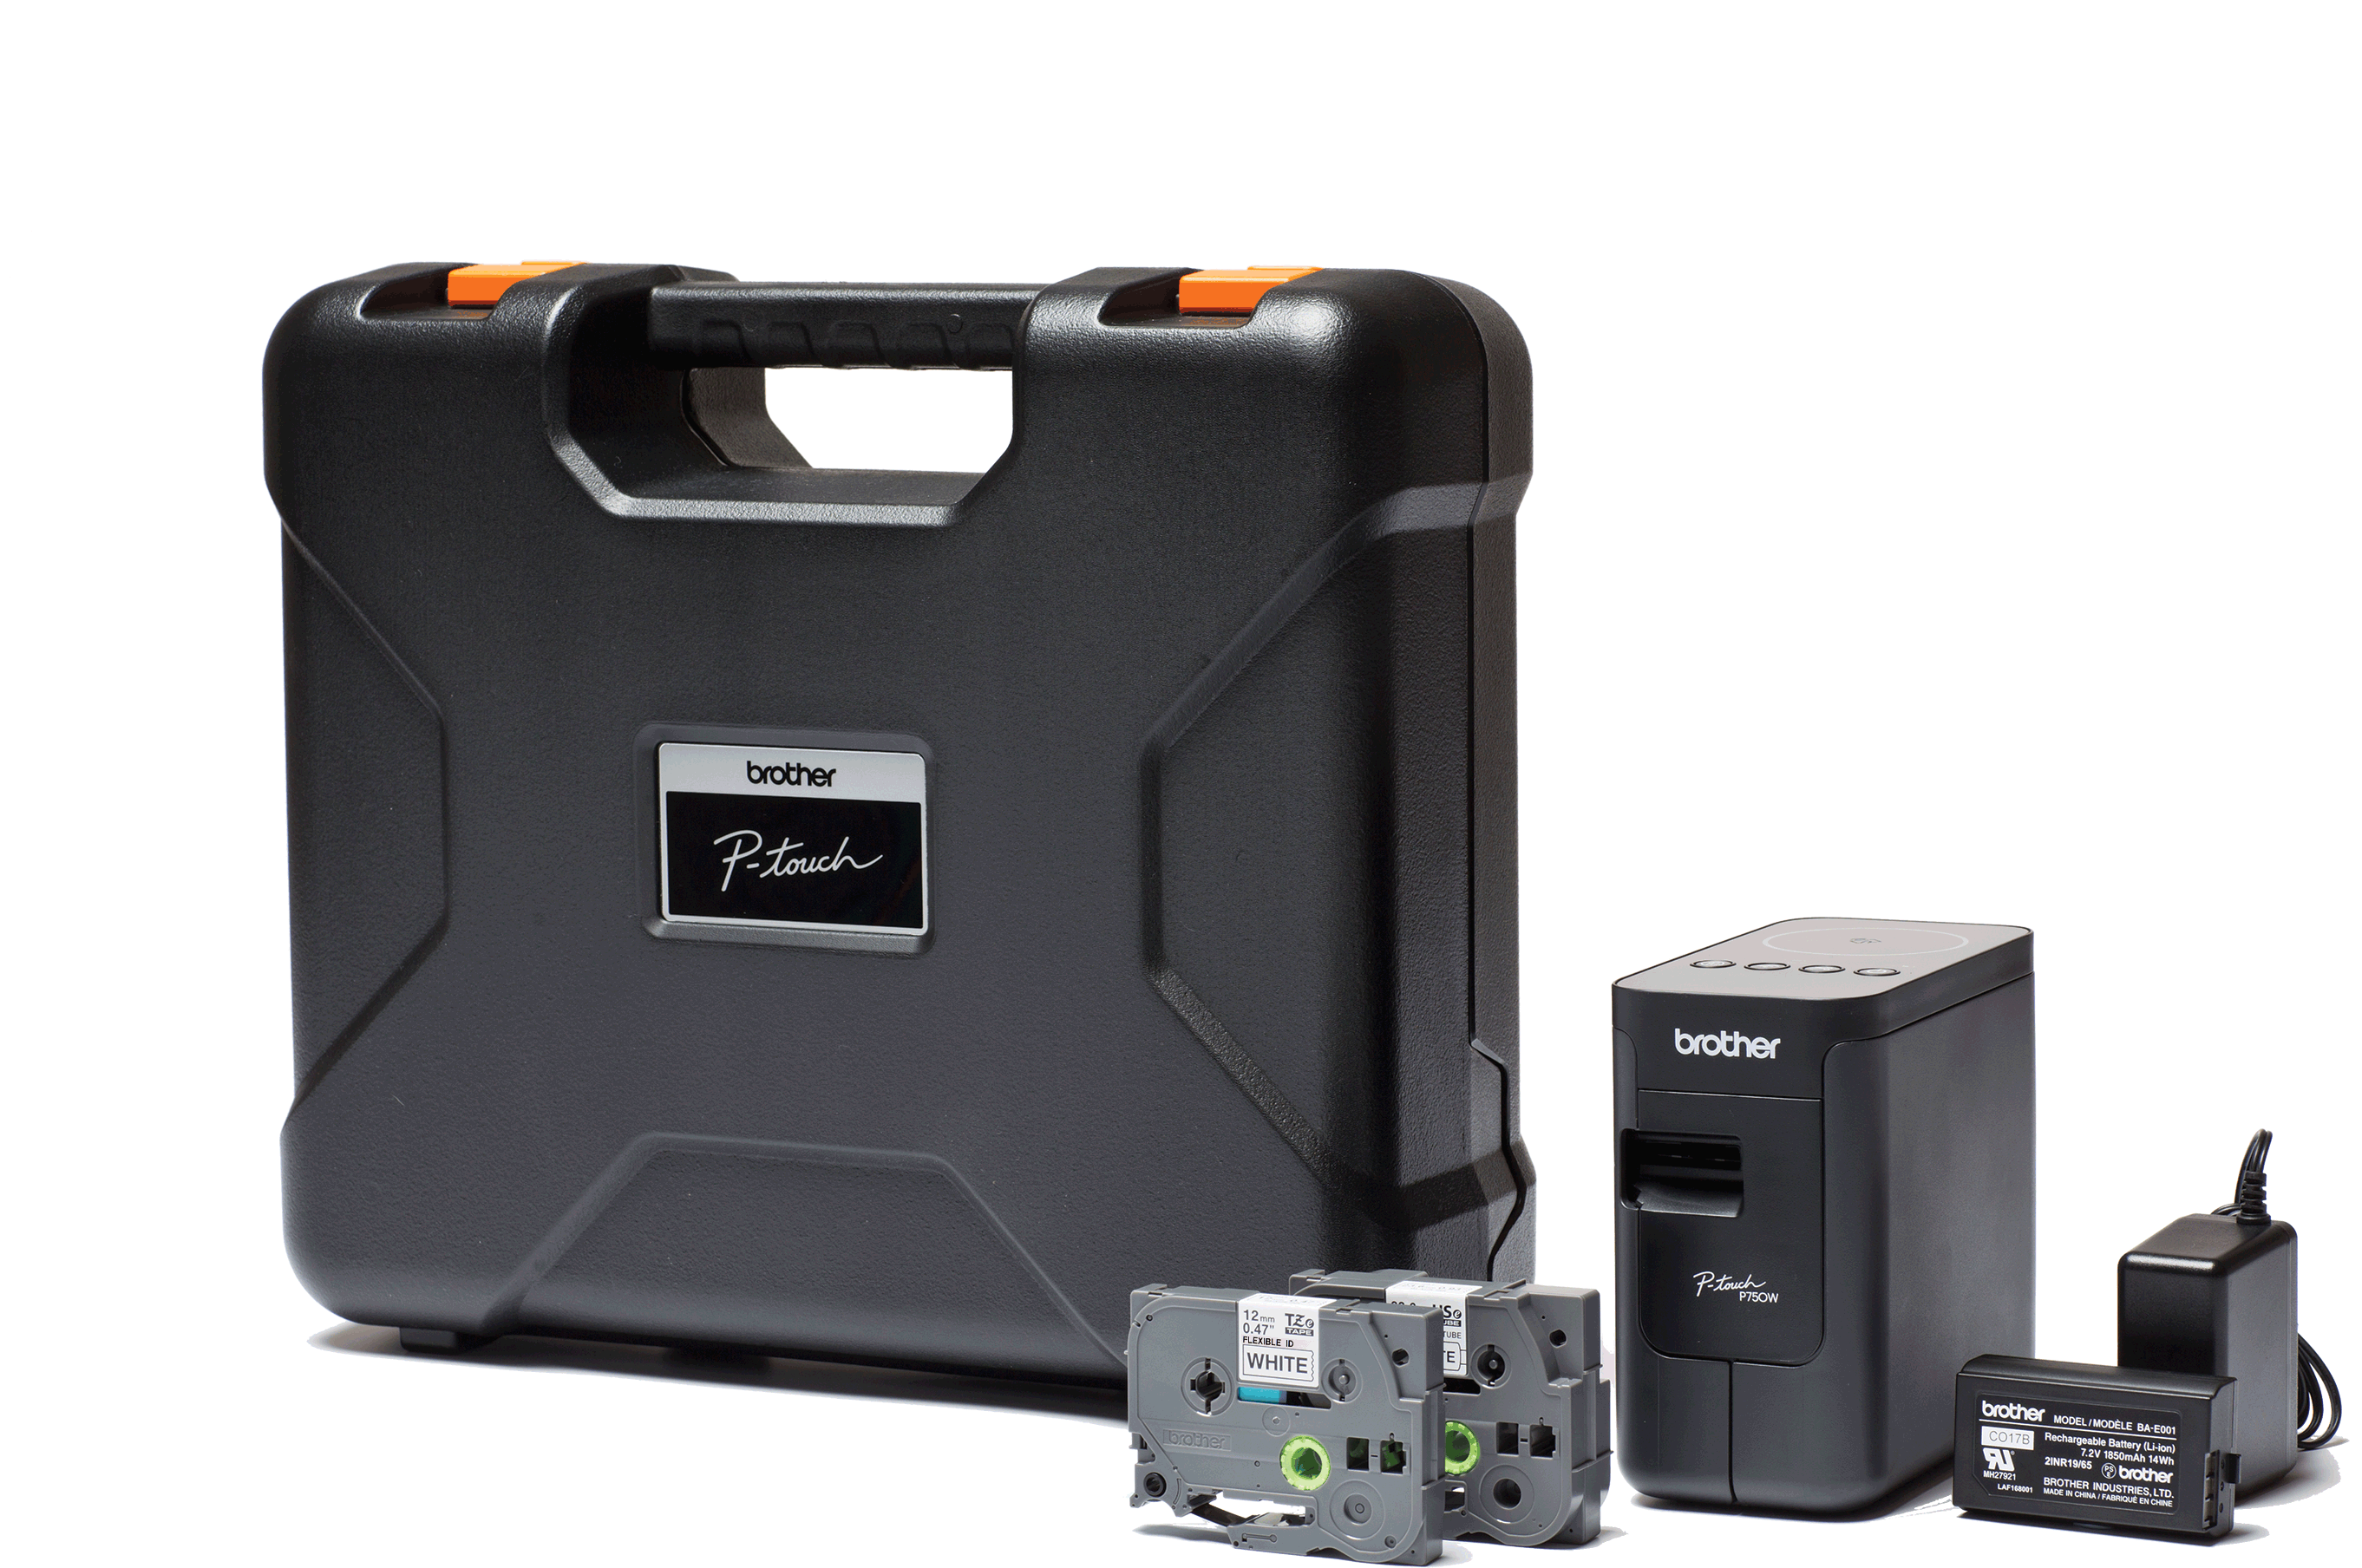 PT-P750TDI P-touch tape labelprinter 2